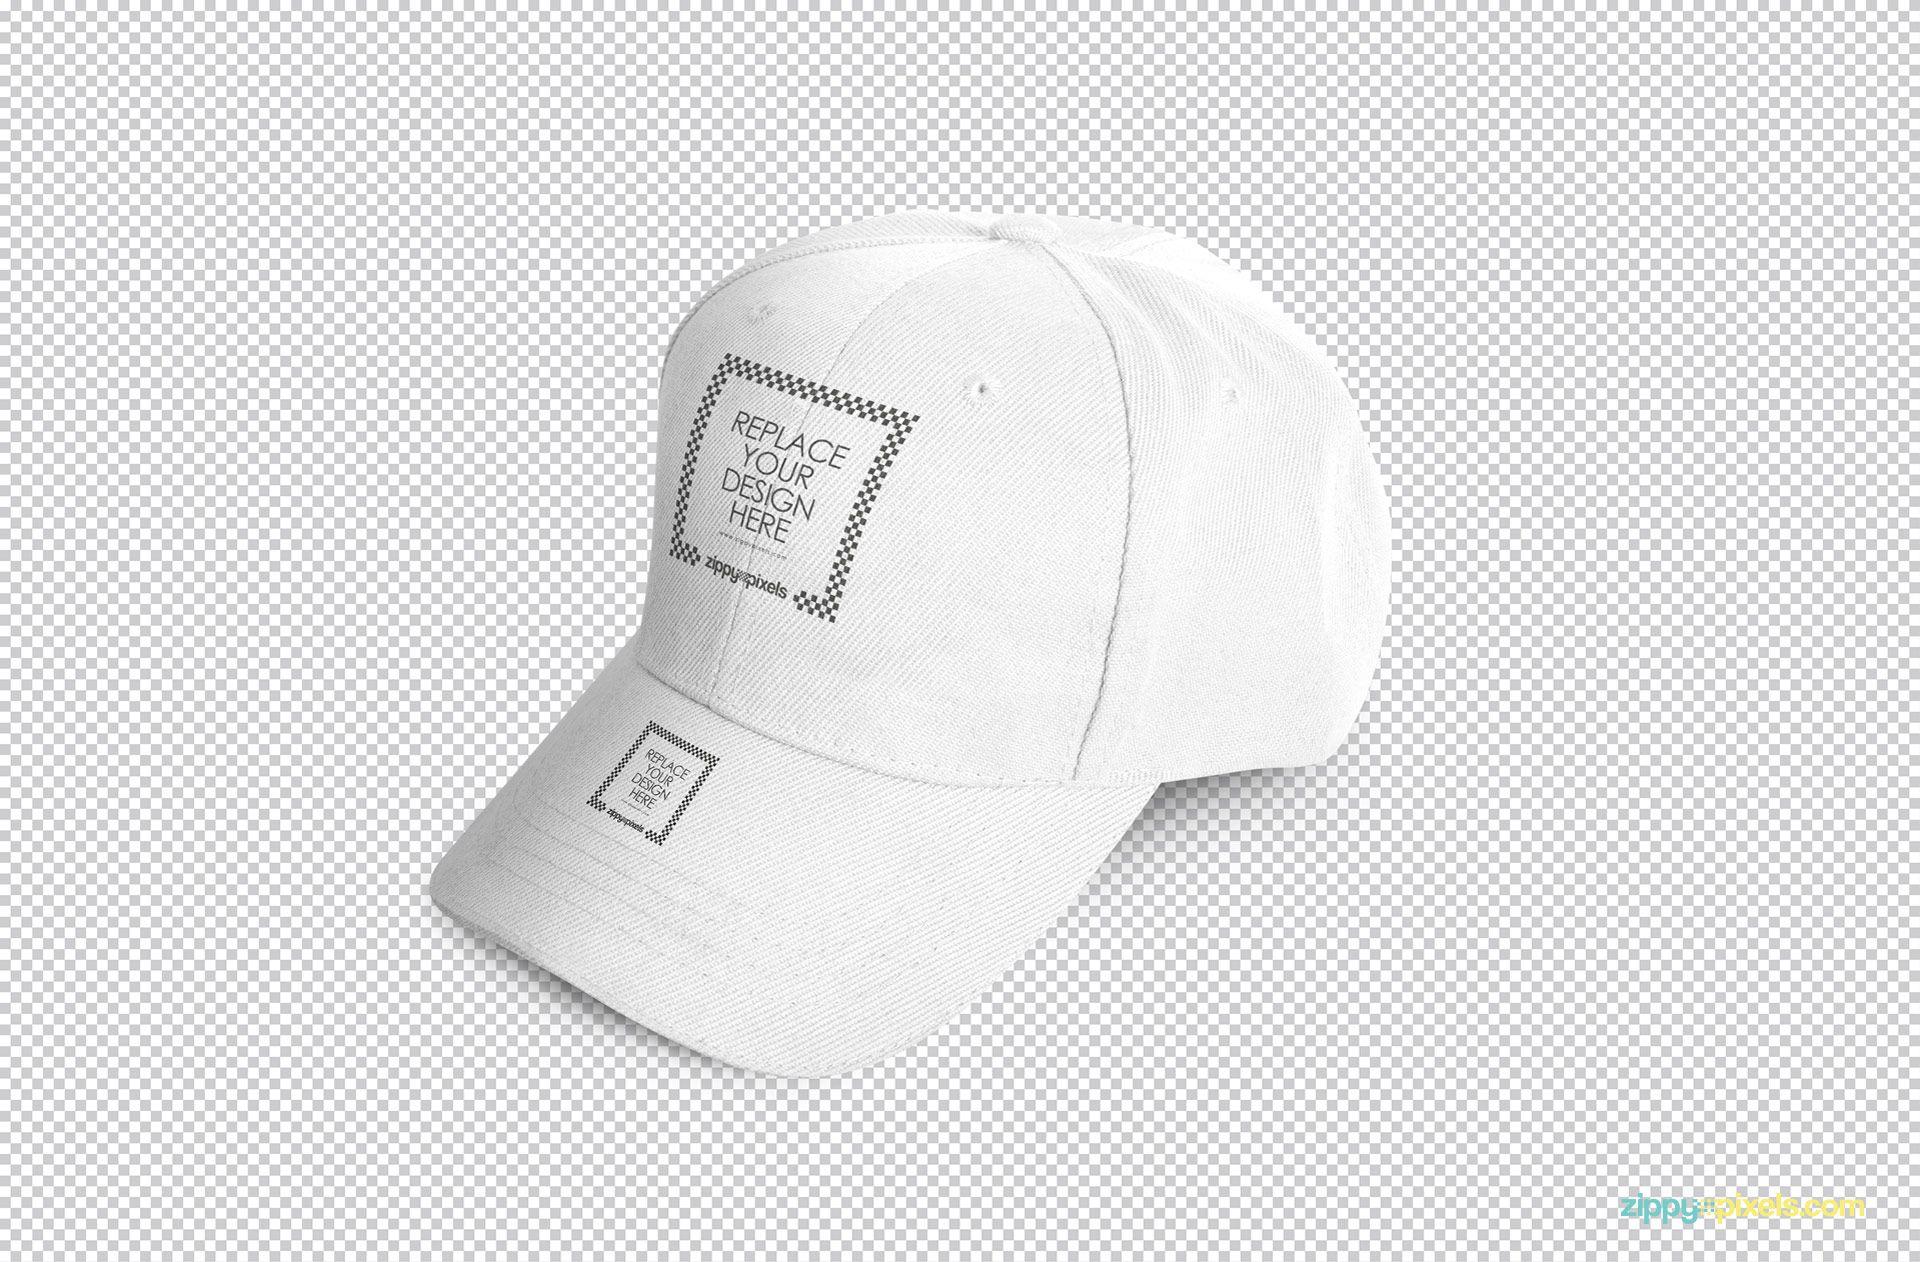 Customizable Free Dad Hat Mockup Psd Zippypixels Dad Hats Hats Clothing Mockup